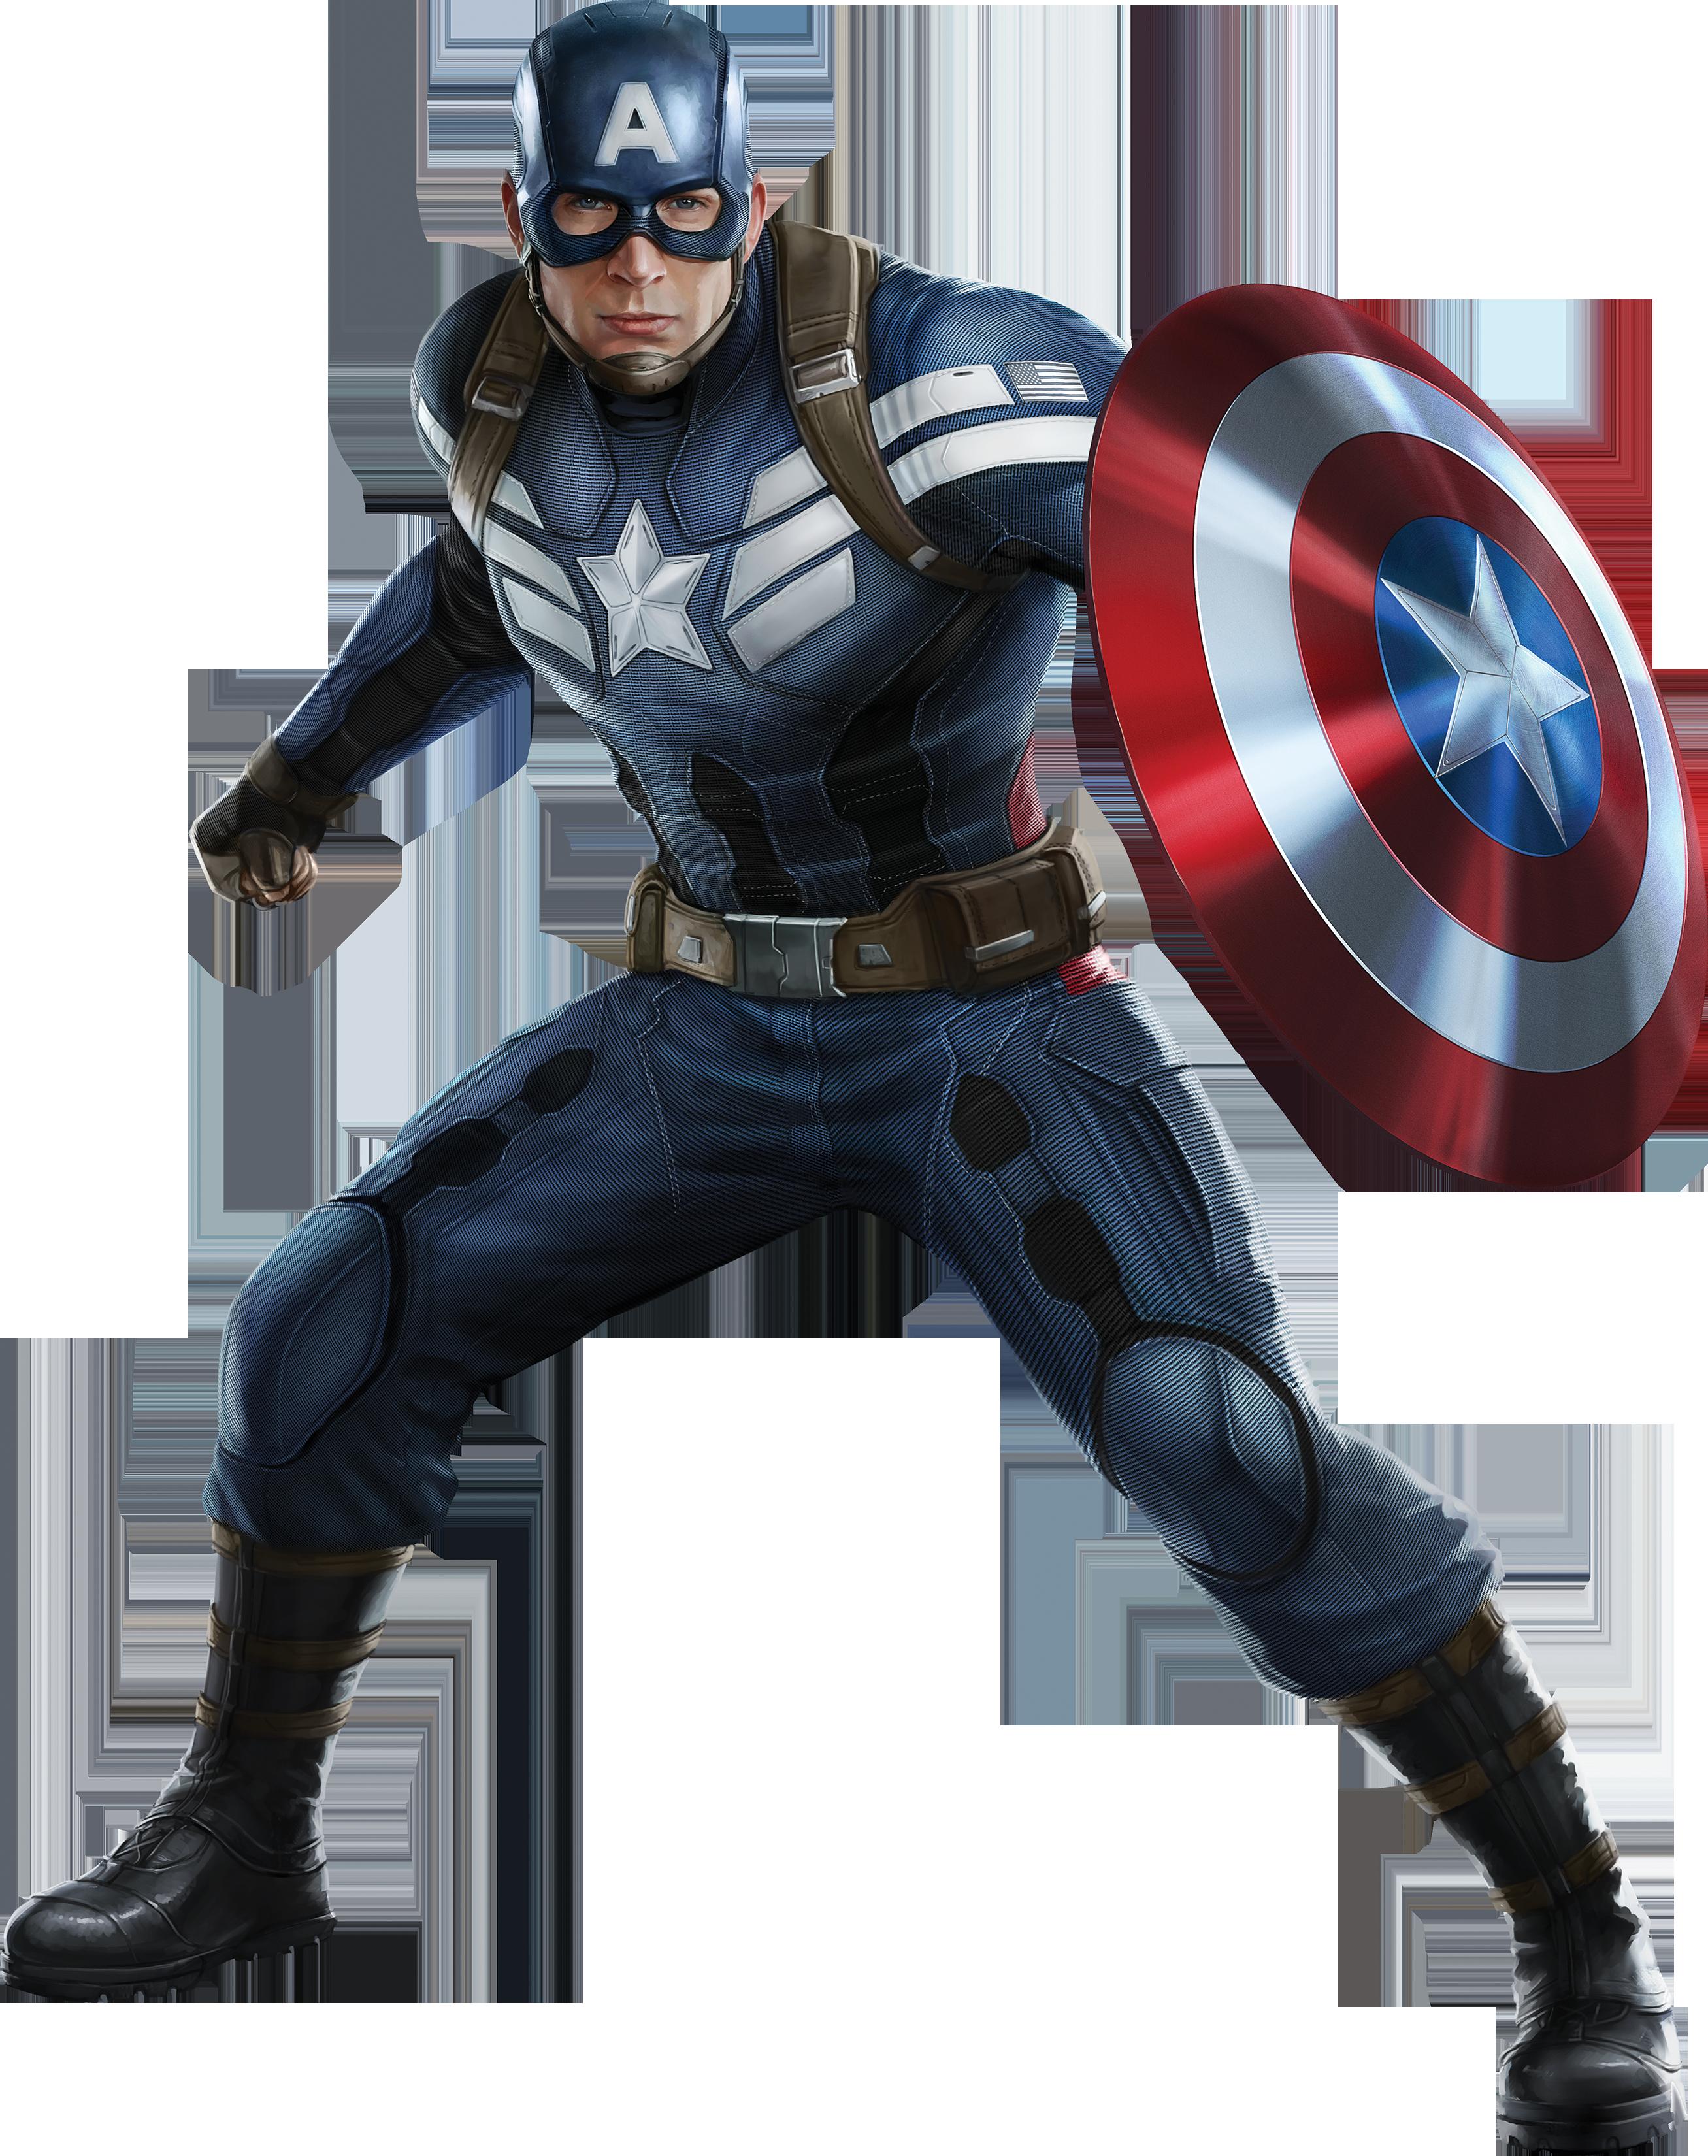 Captain America The Winter Soldier Captain America Promo Art Captain America Marvel Captain America Captain America Winter Soldier